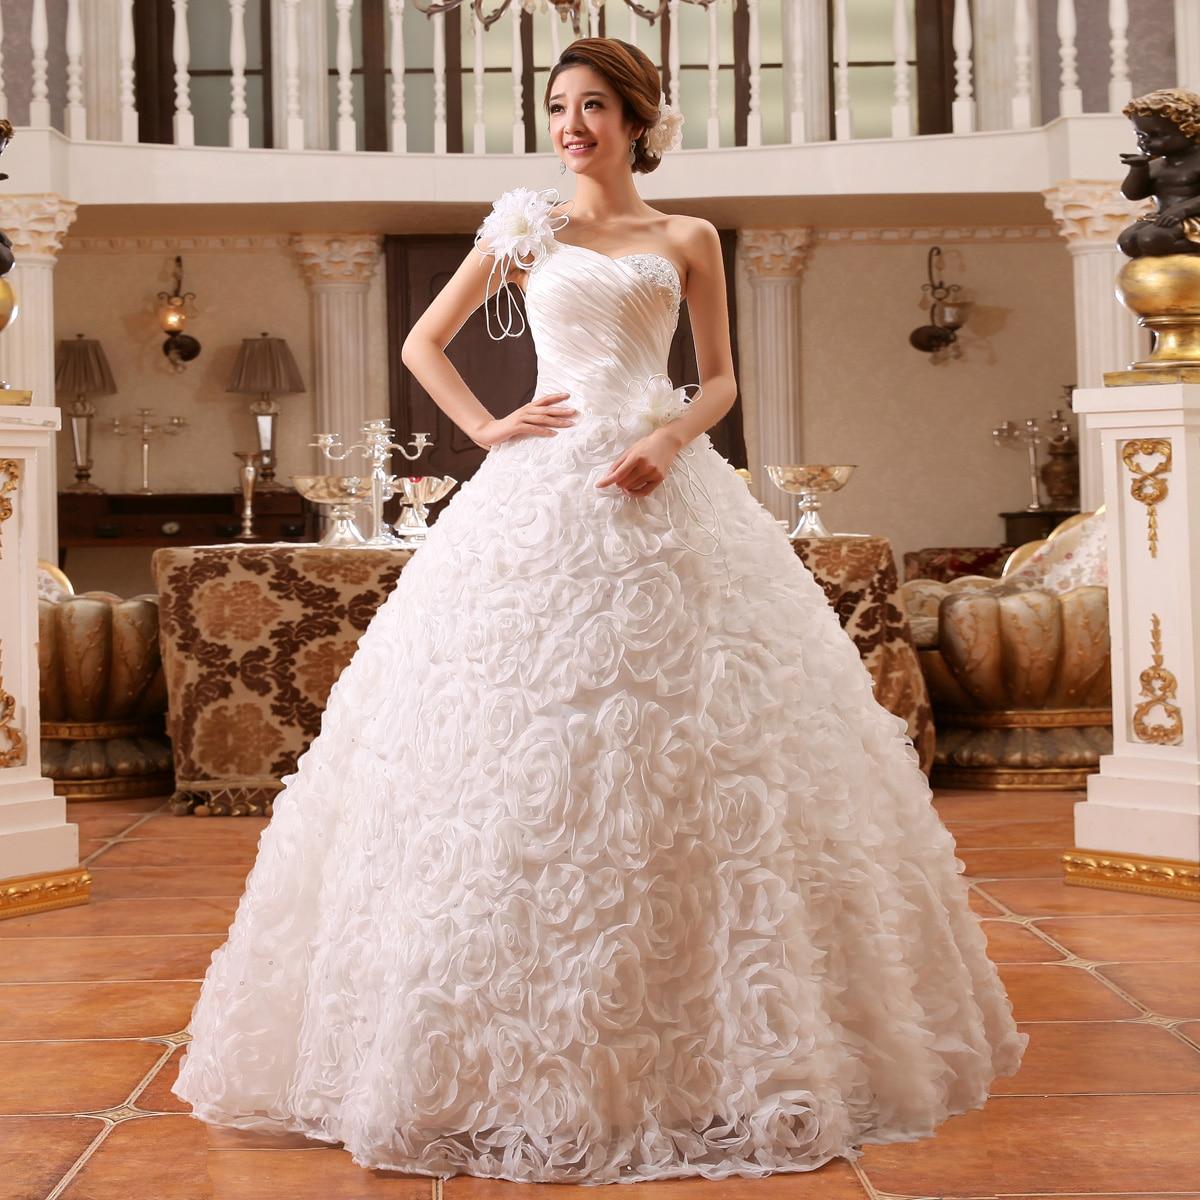 Wedding Dress Ball Gowns New One Shoulder Princess Plus Size Satin Wedding Dresses Bride Bridal Flower Embroidery Dressses